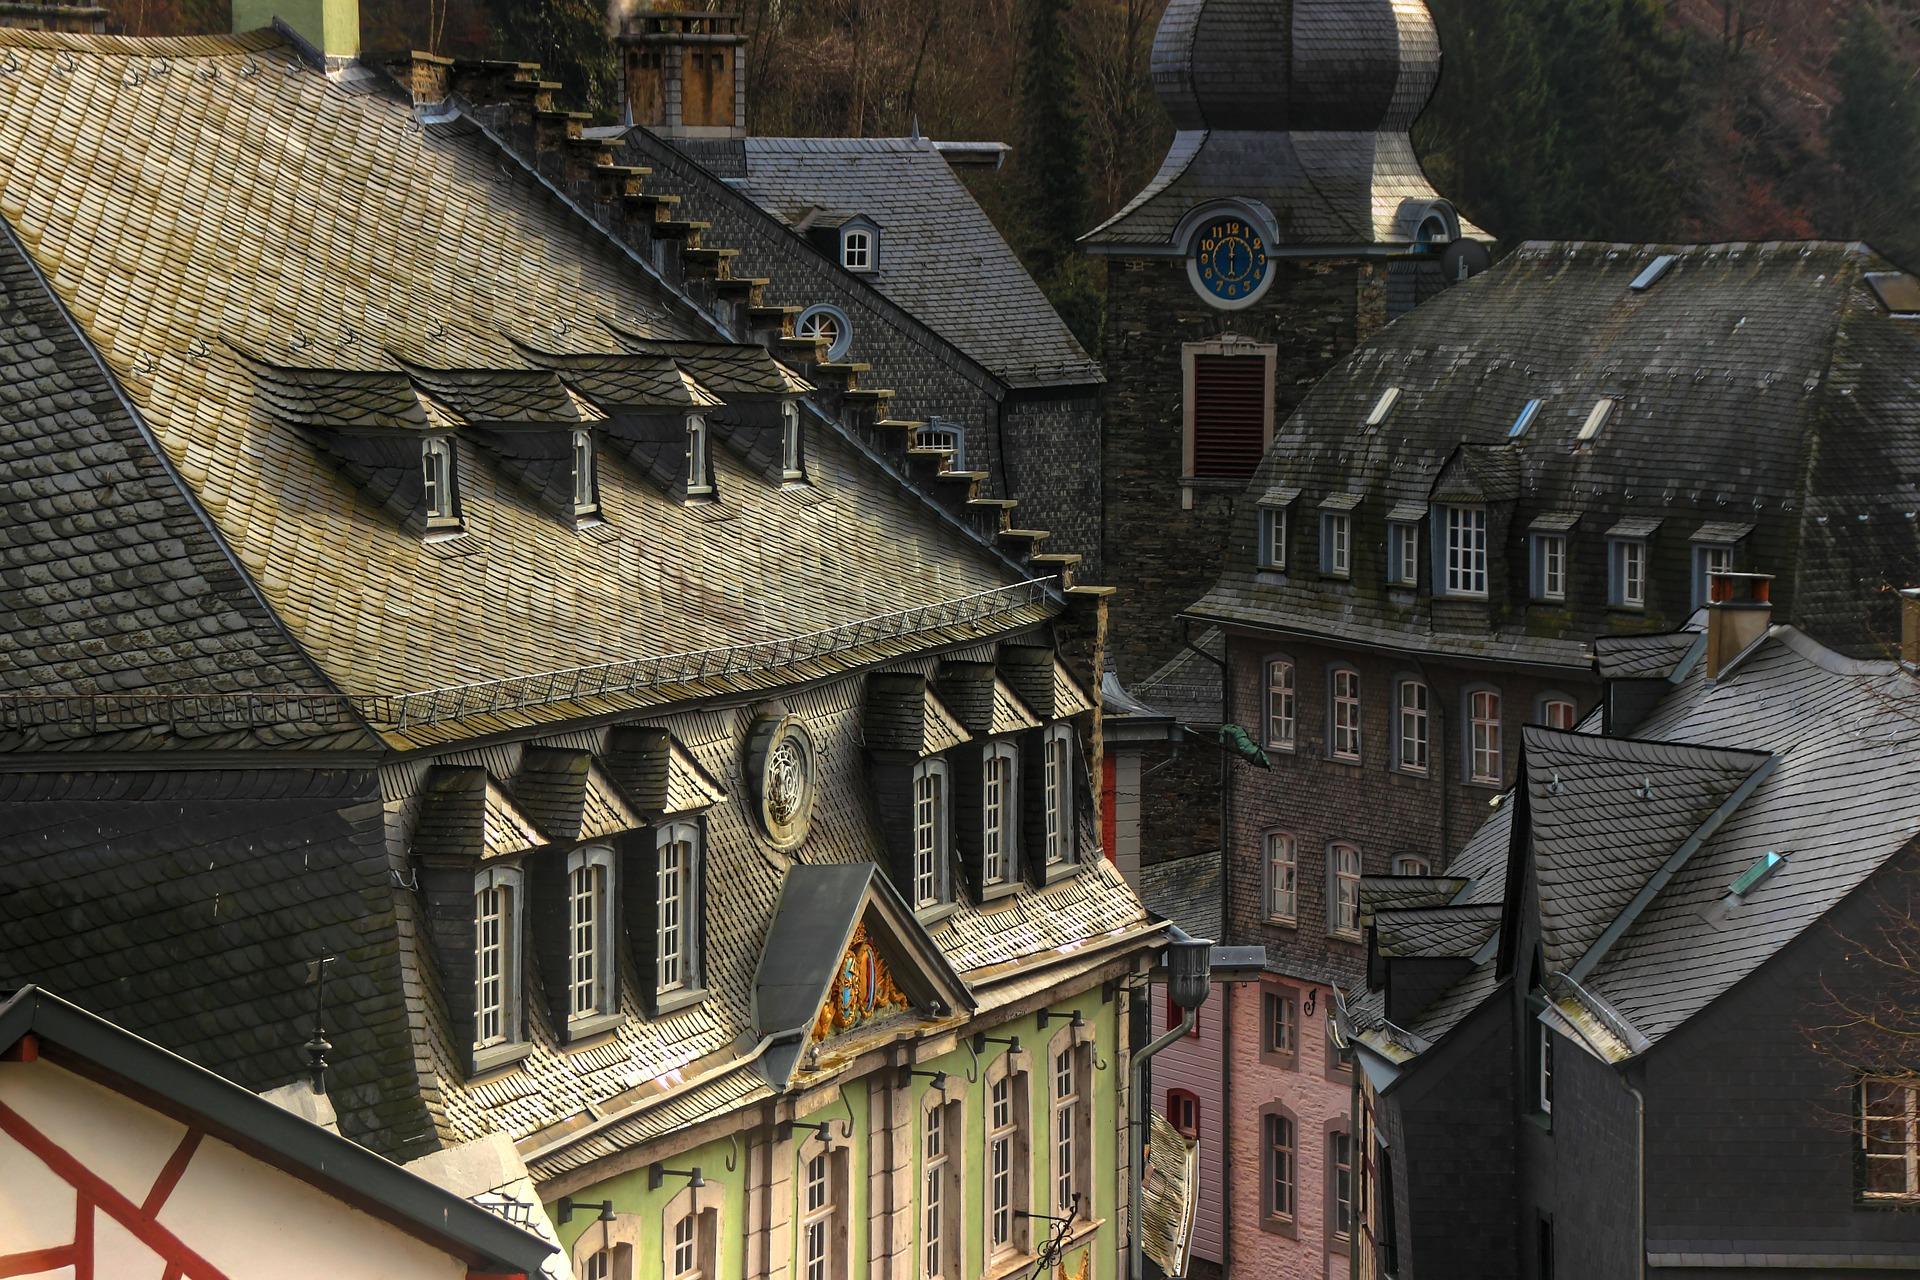 Monschau Old Town.jpg